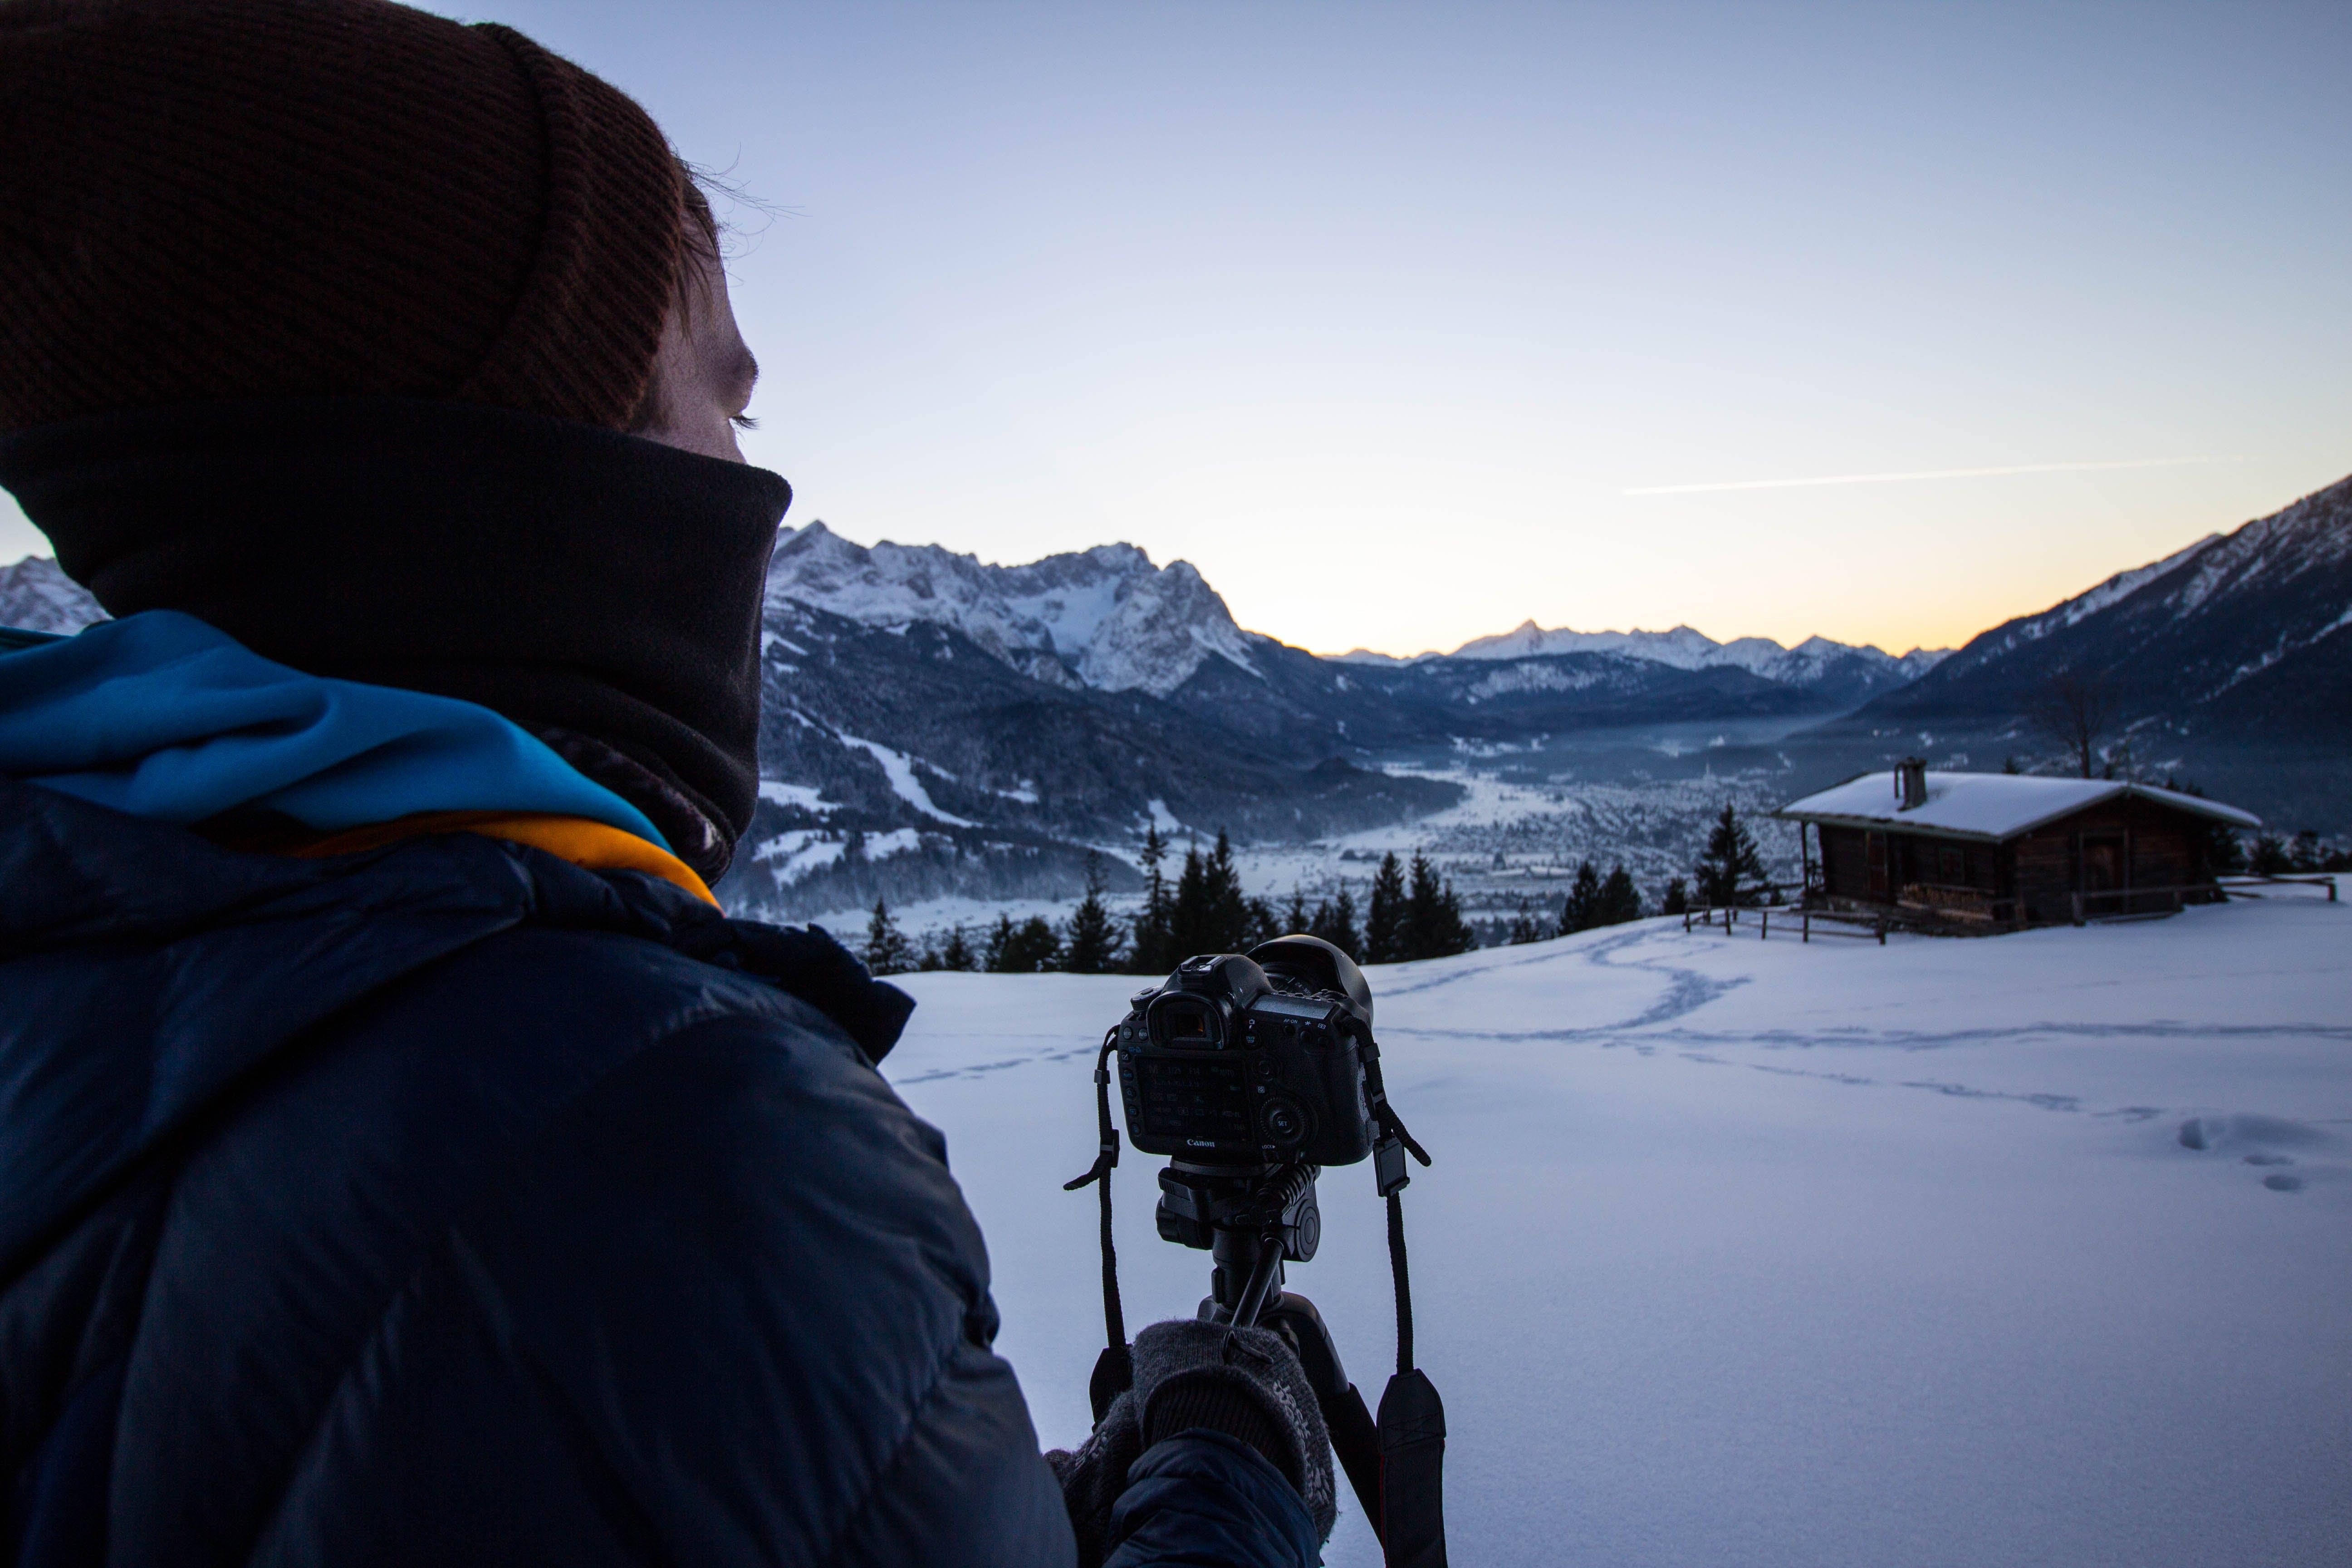 Man Holding Camera Stabilizer